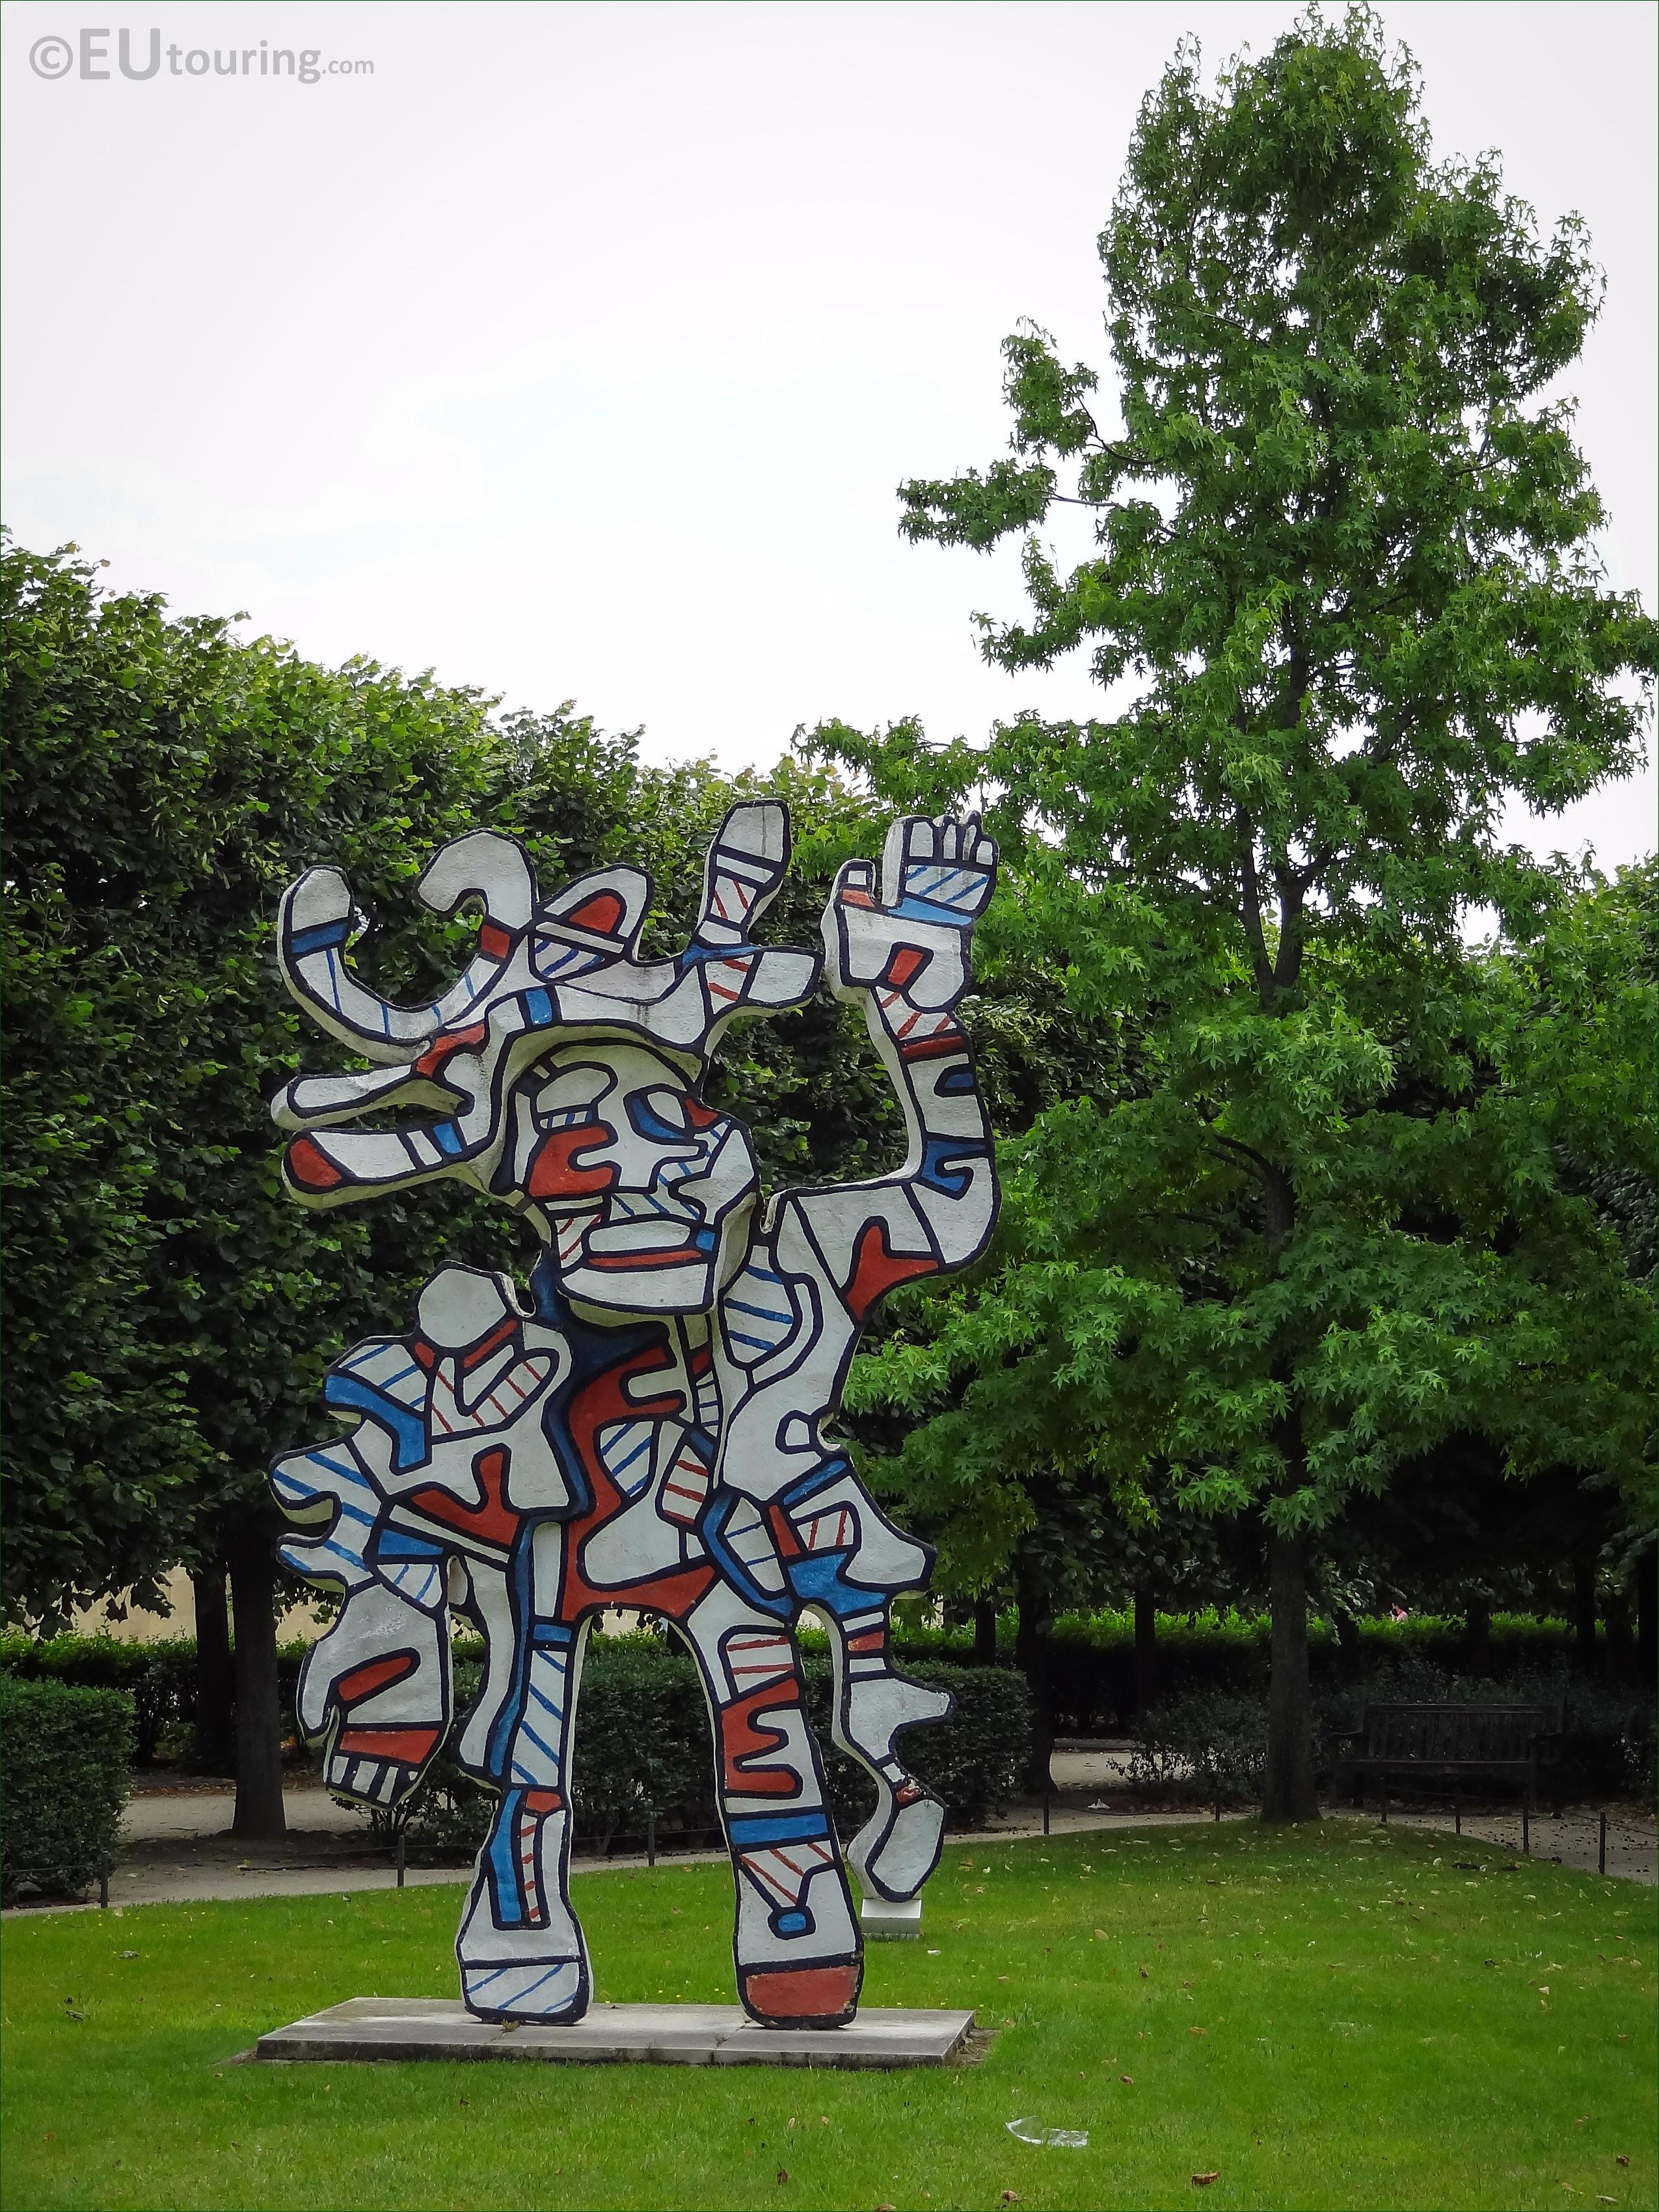 Photos of le bel costume statue in jardin des tuileries for Costume nain de jardin